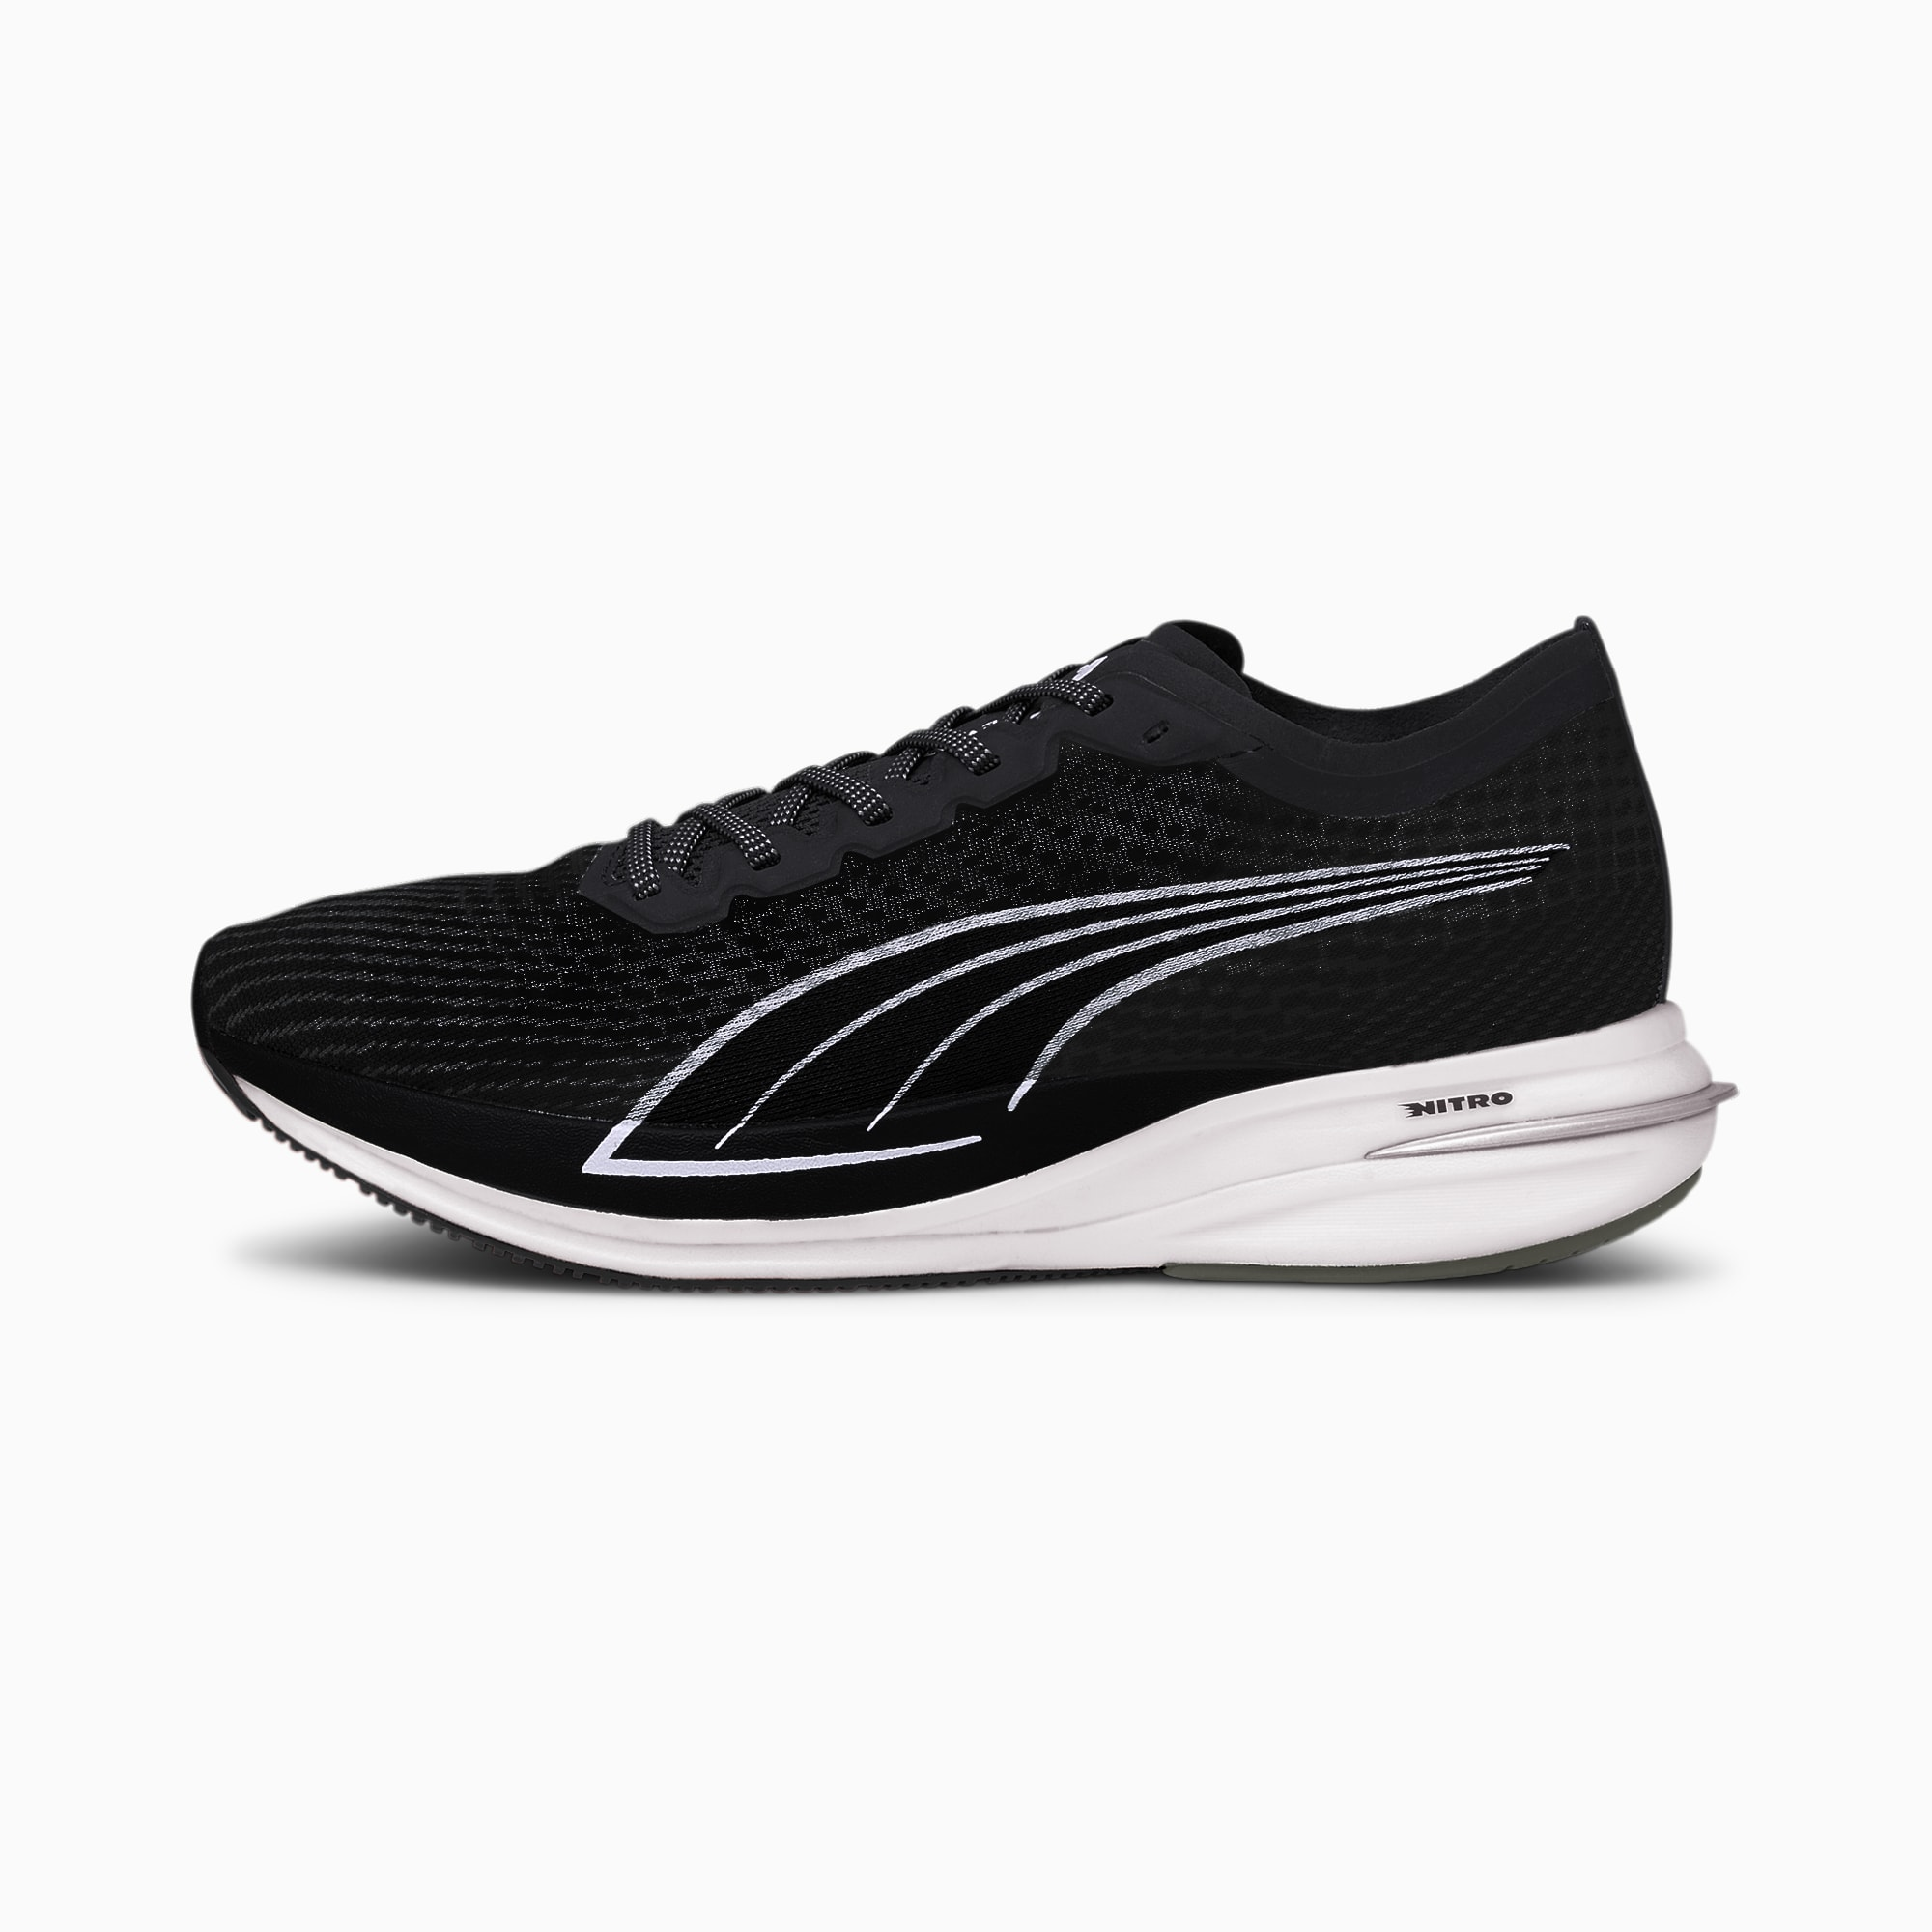 Zapatillas de Running Deviate Nitro Para Hombre, Plateado/Negro, Talla 44.5   PUMA Hombres